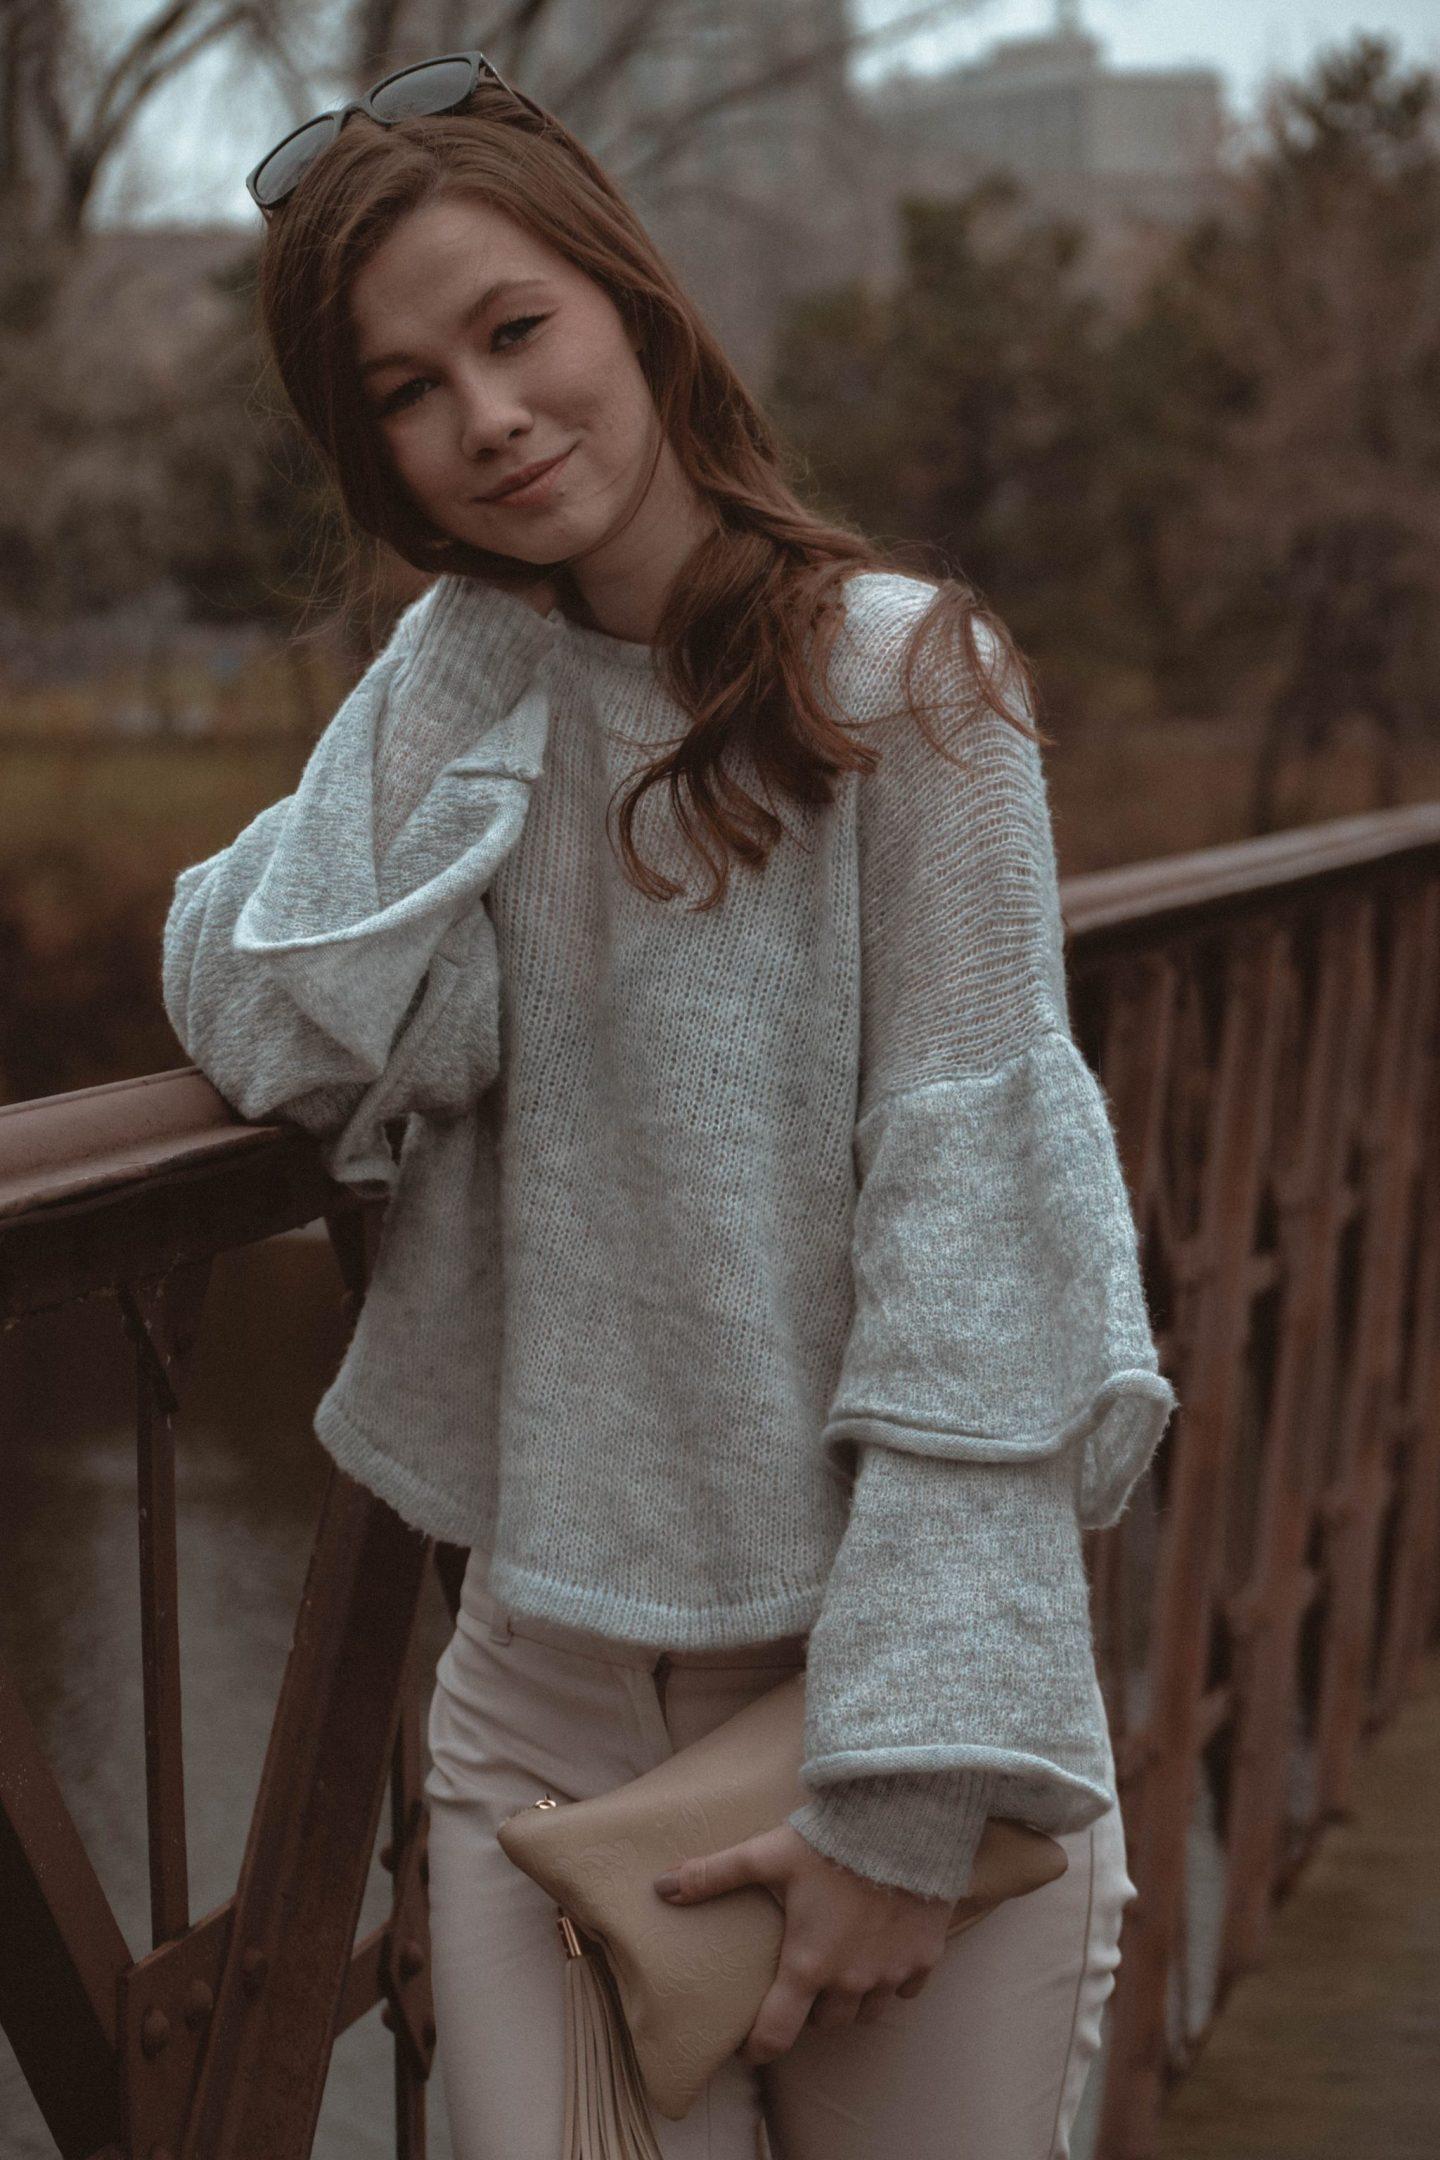 Monochrome Minimalist | Amy Lynn Clothing | London | UK | Workwear | Workwear trends | Floral Midi Skirt | Ruffled Knit | Sweater